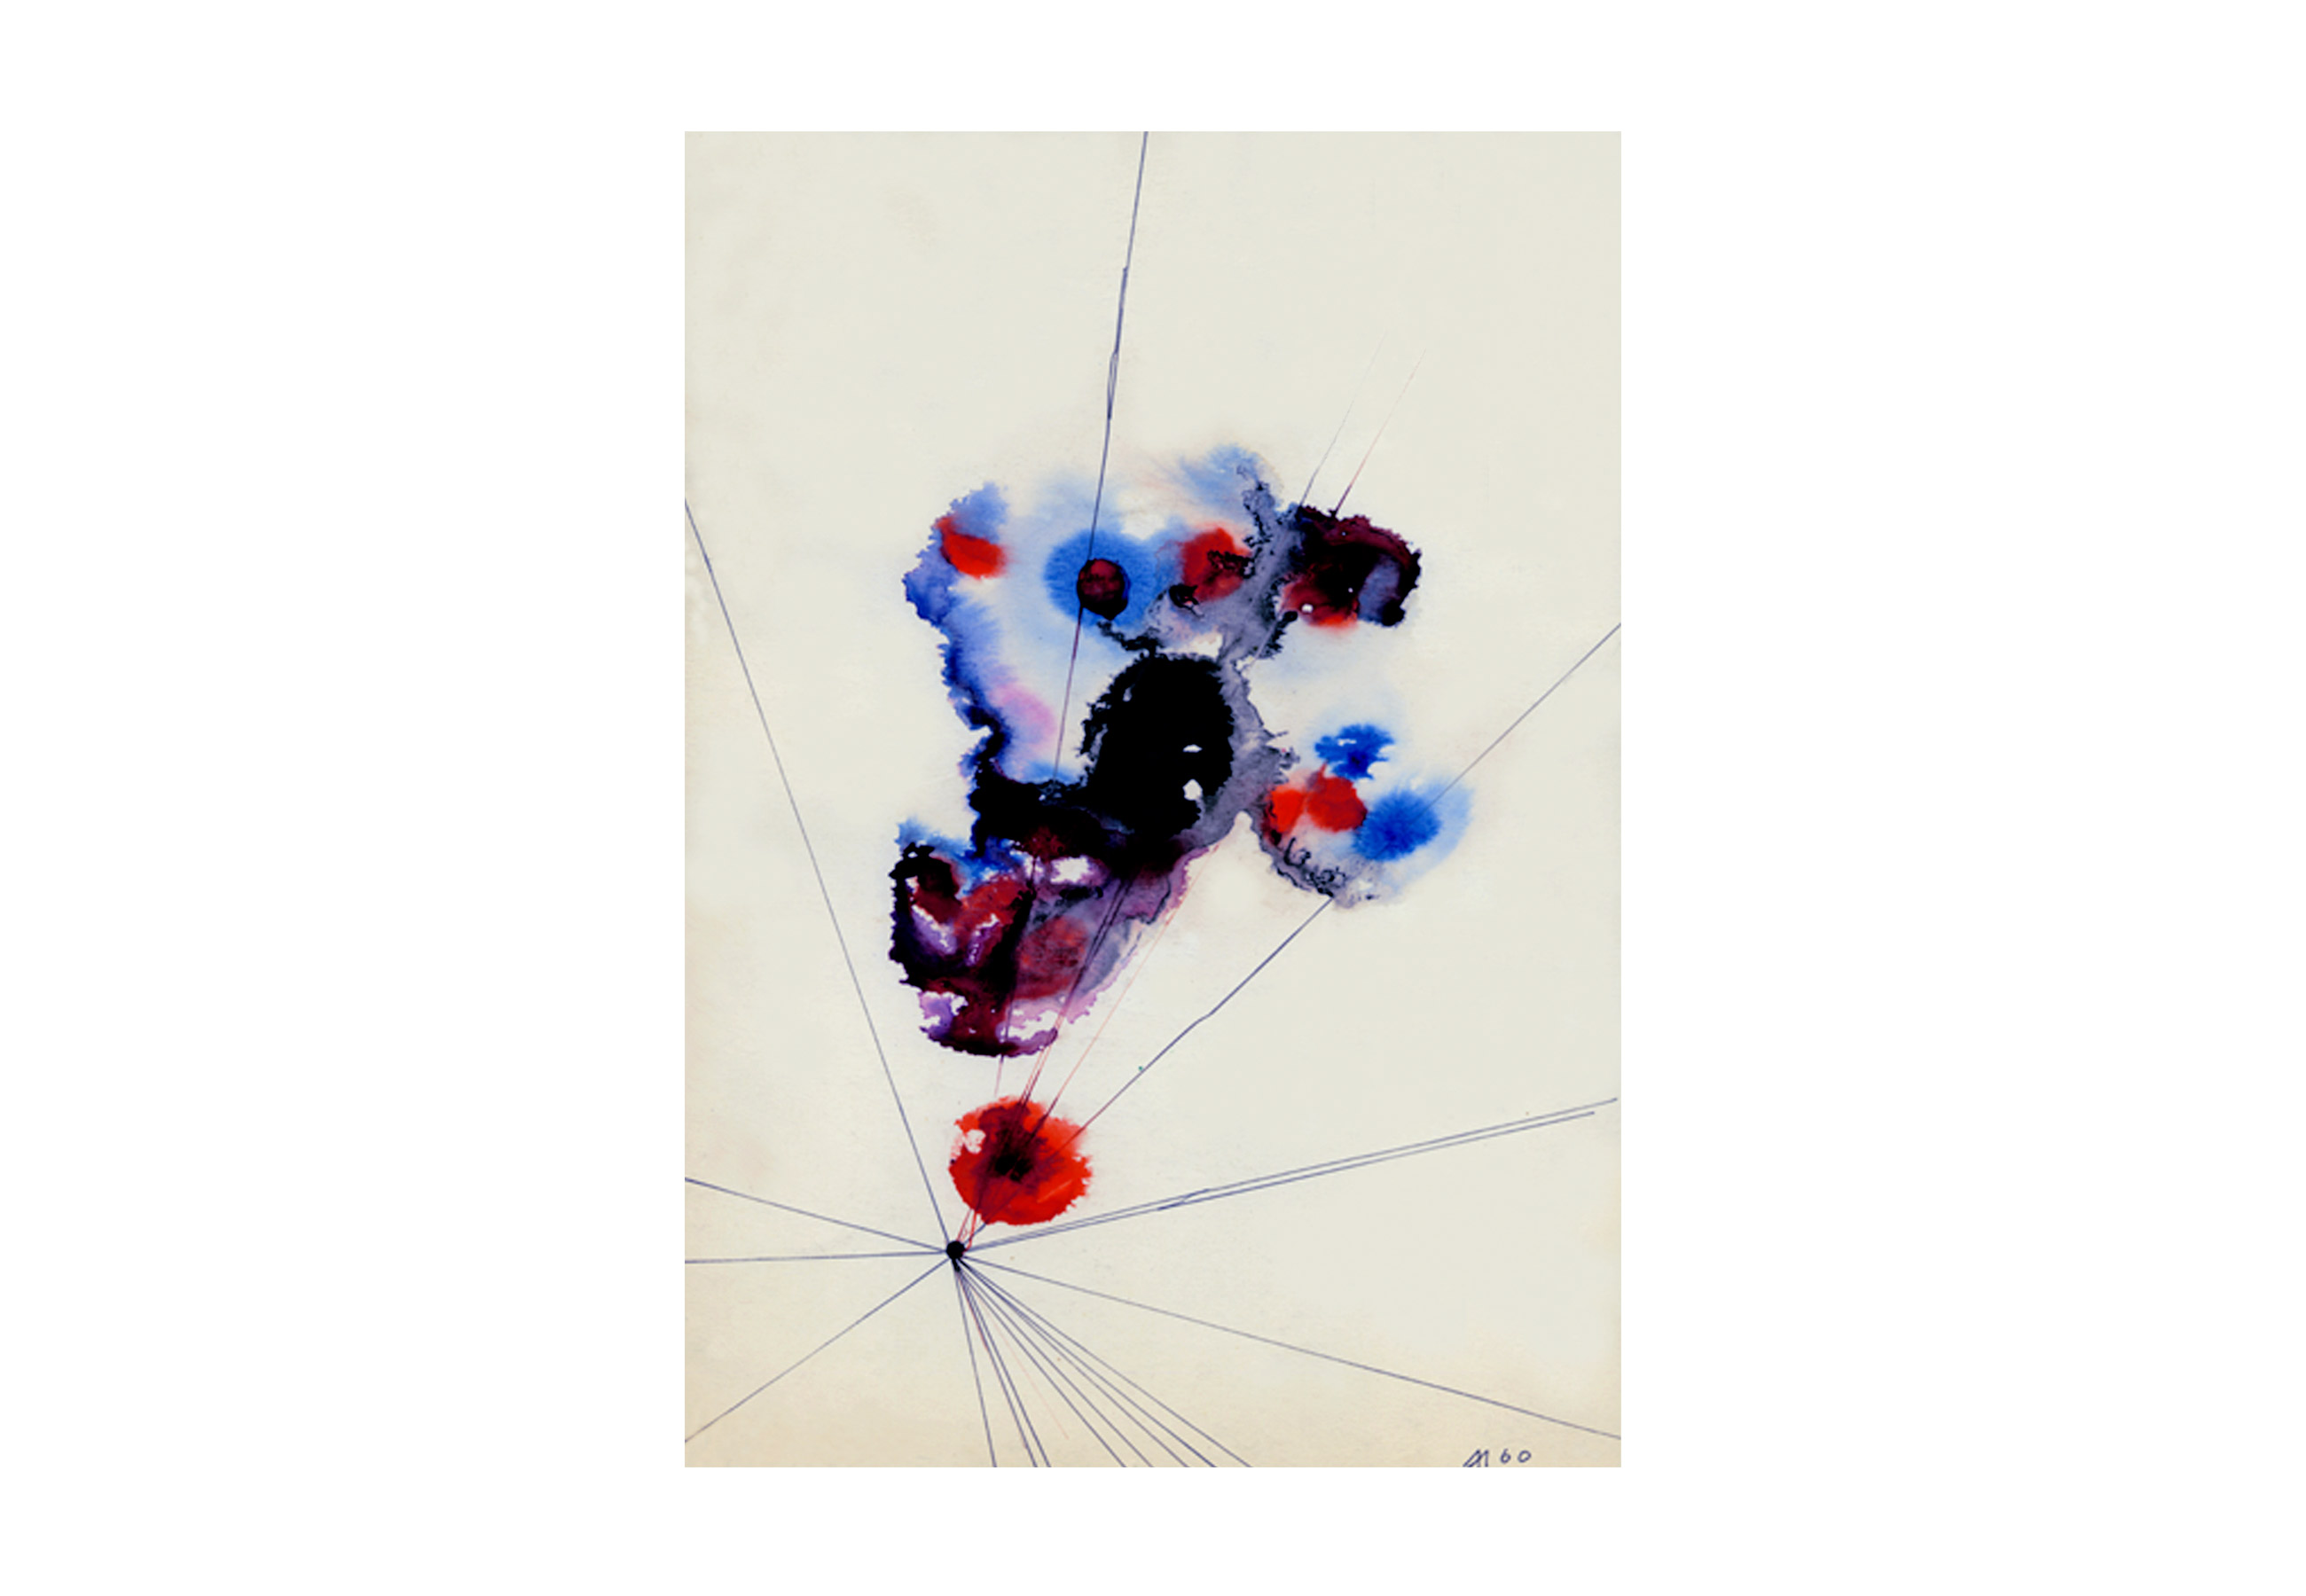 Lamm-Portfolio-1960-69-01.jpg